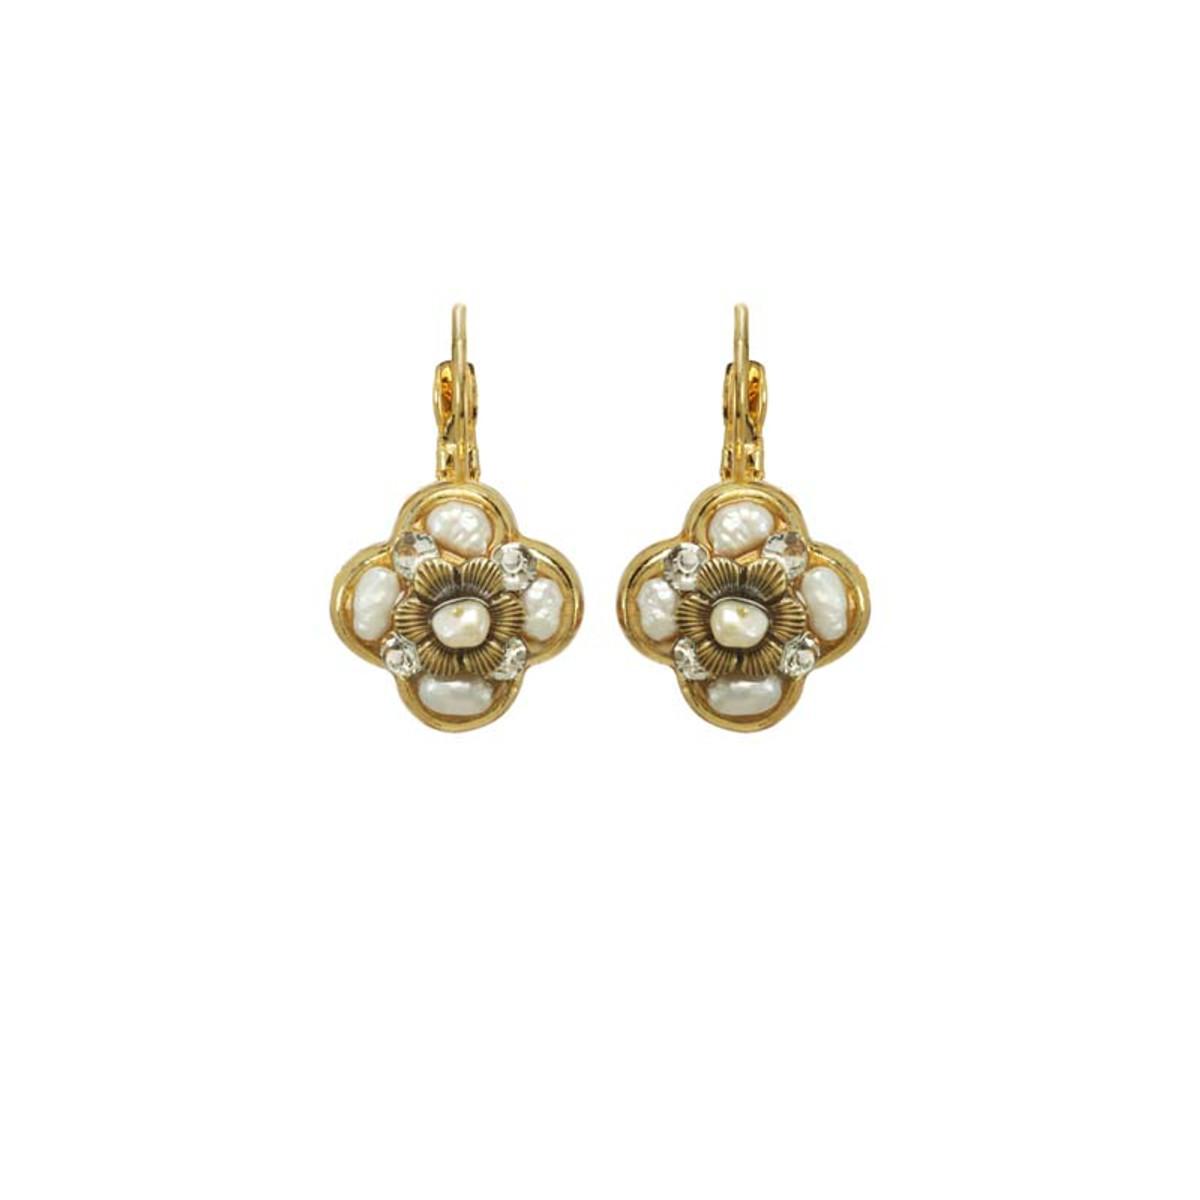 Michal Golan Jewellery Elegante White Earrings